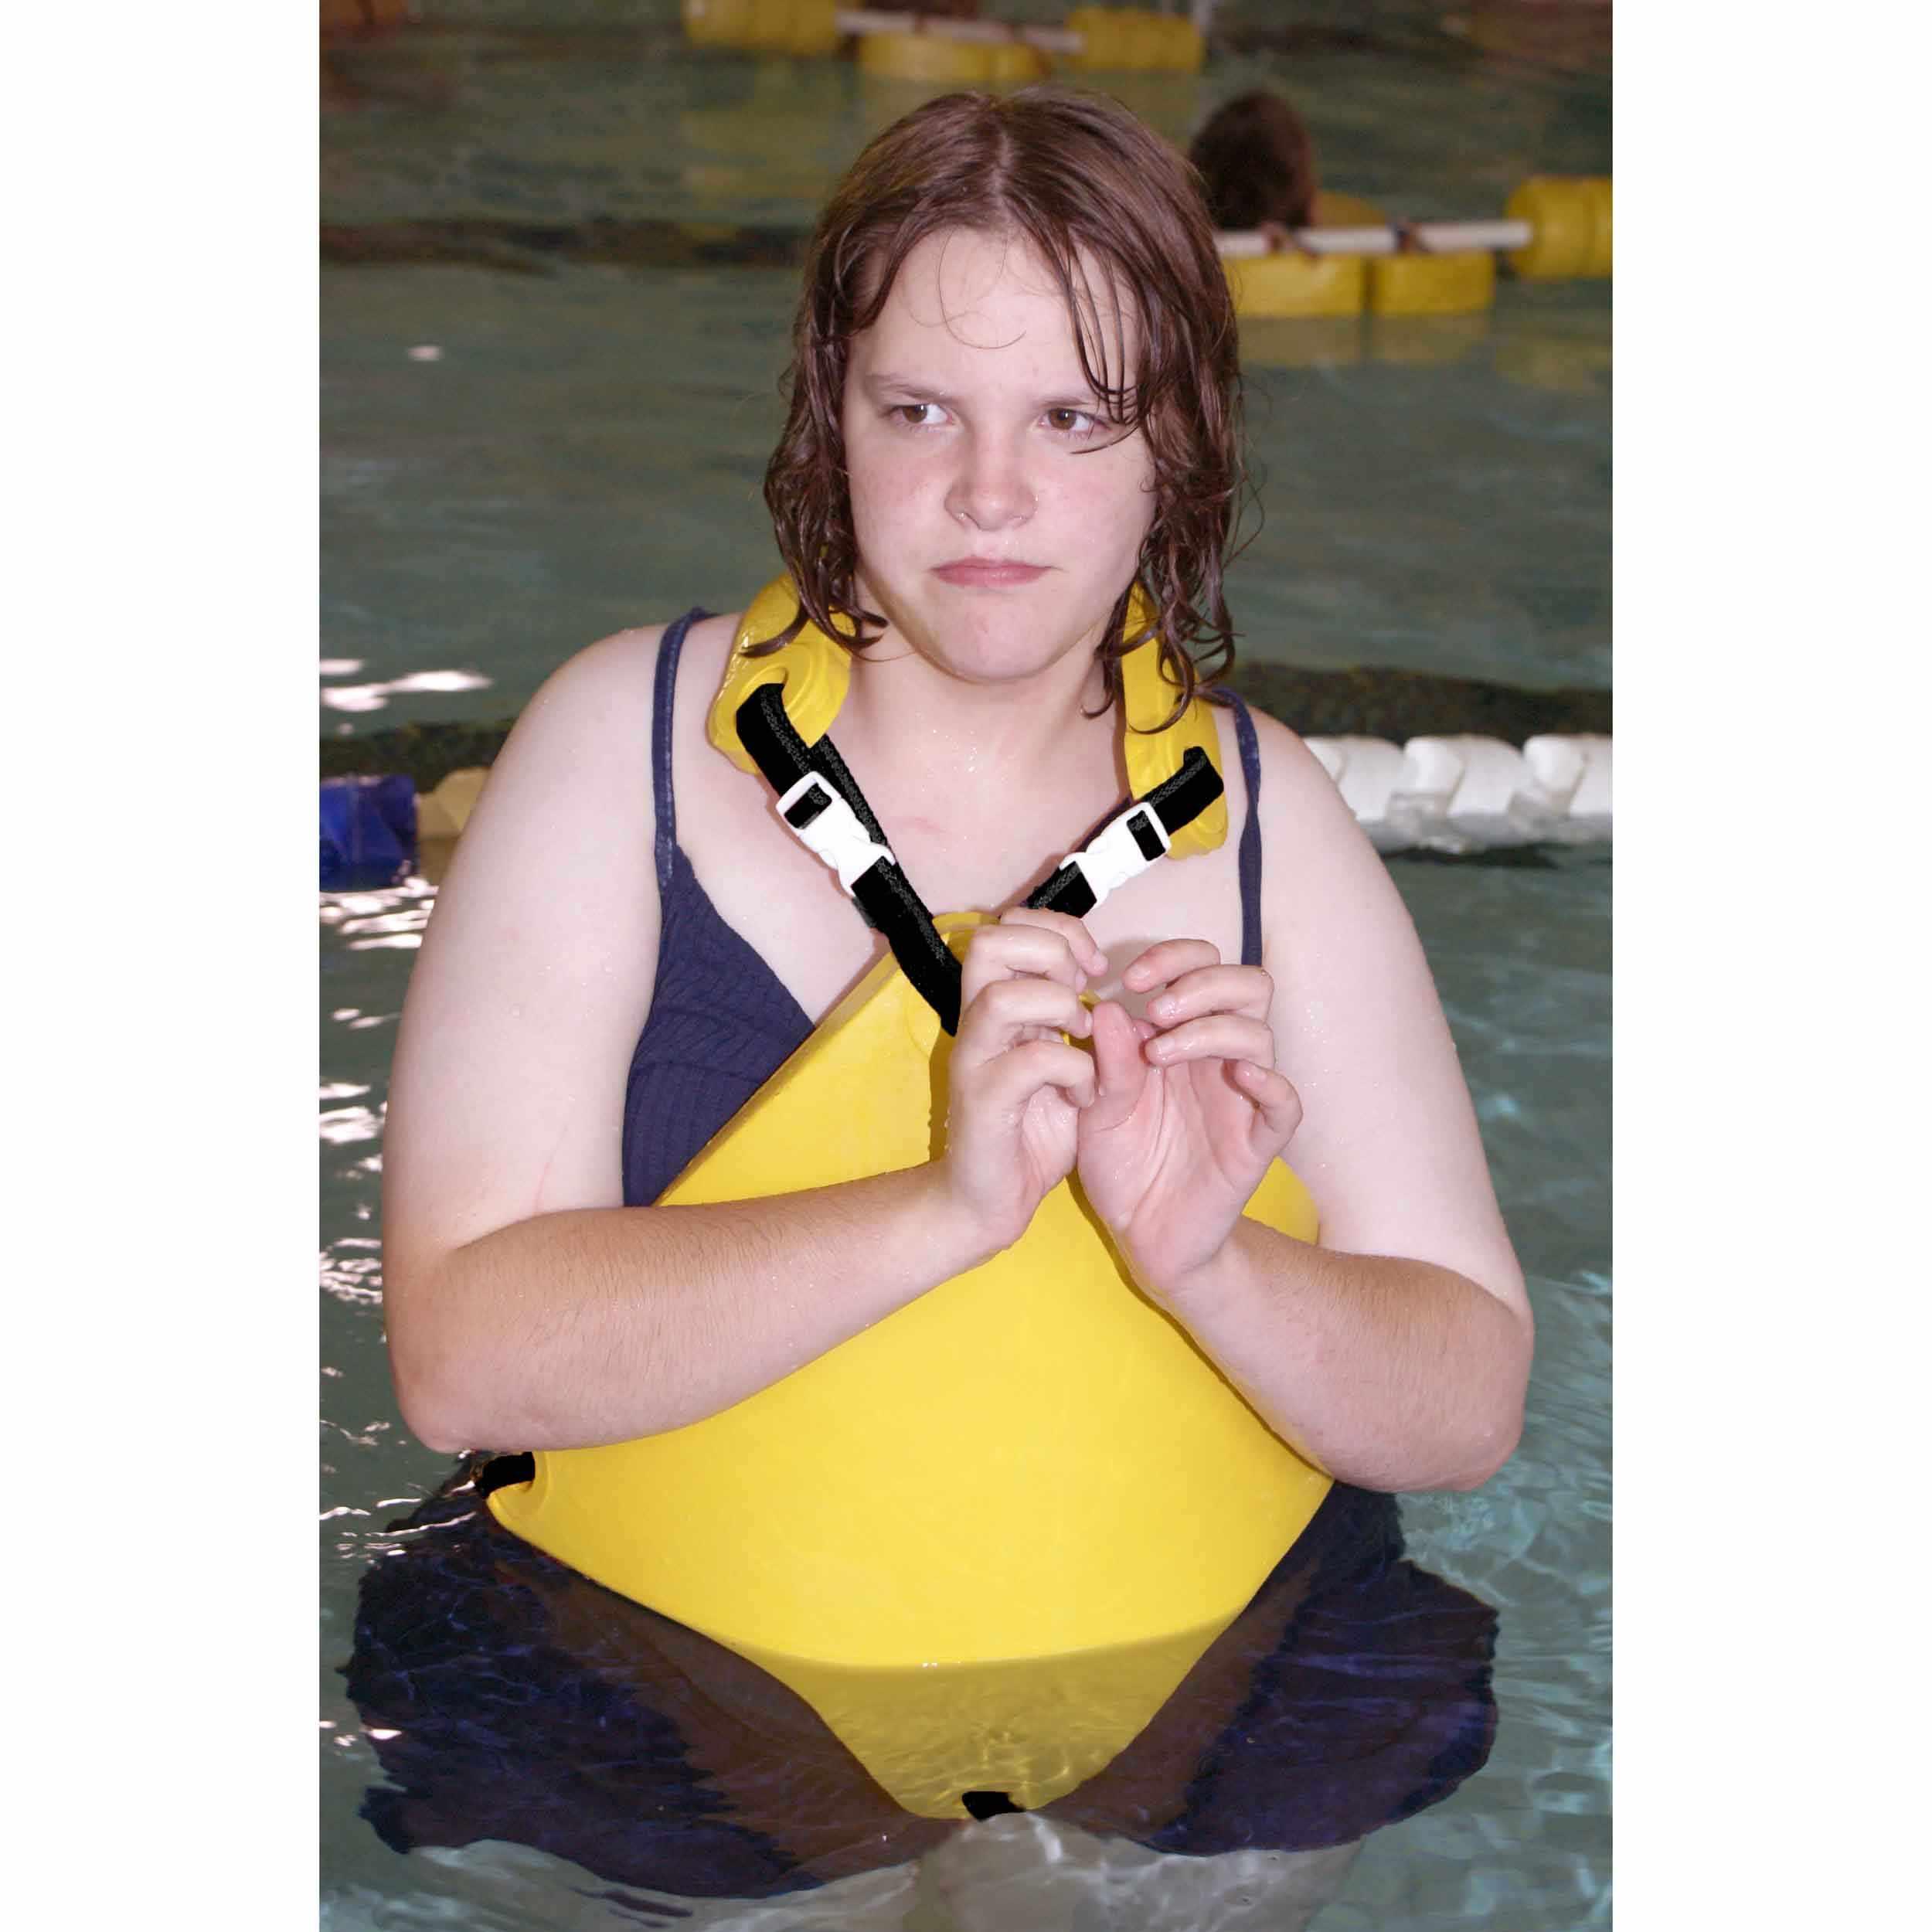 Danmar Delta Swim System | Danmar Products 8720 - Medicaleshop